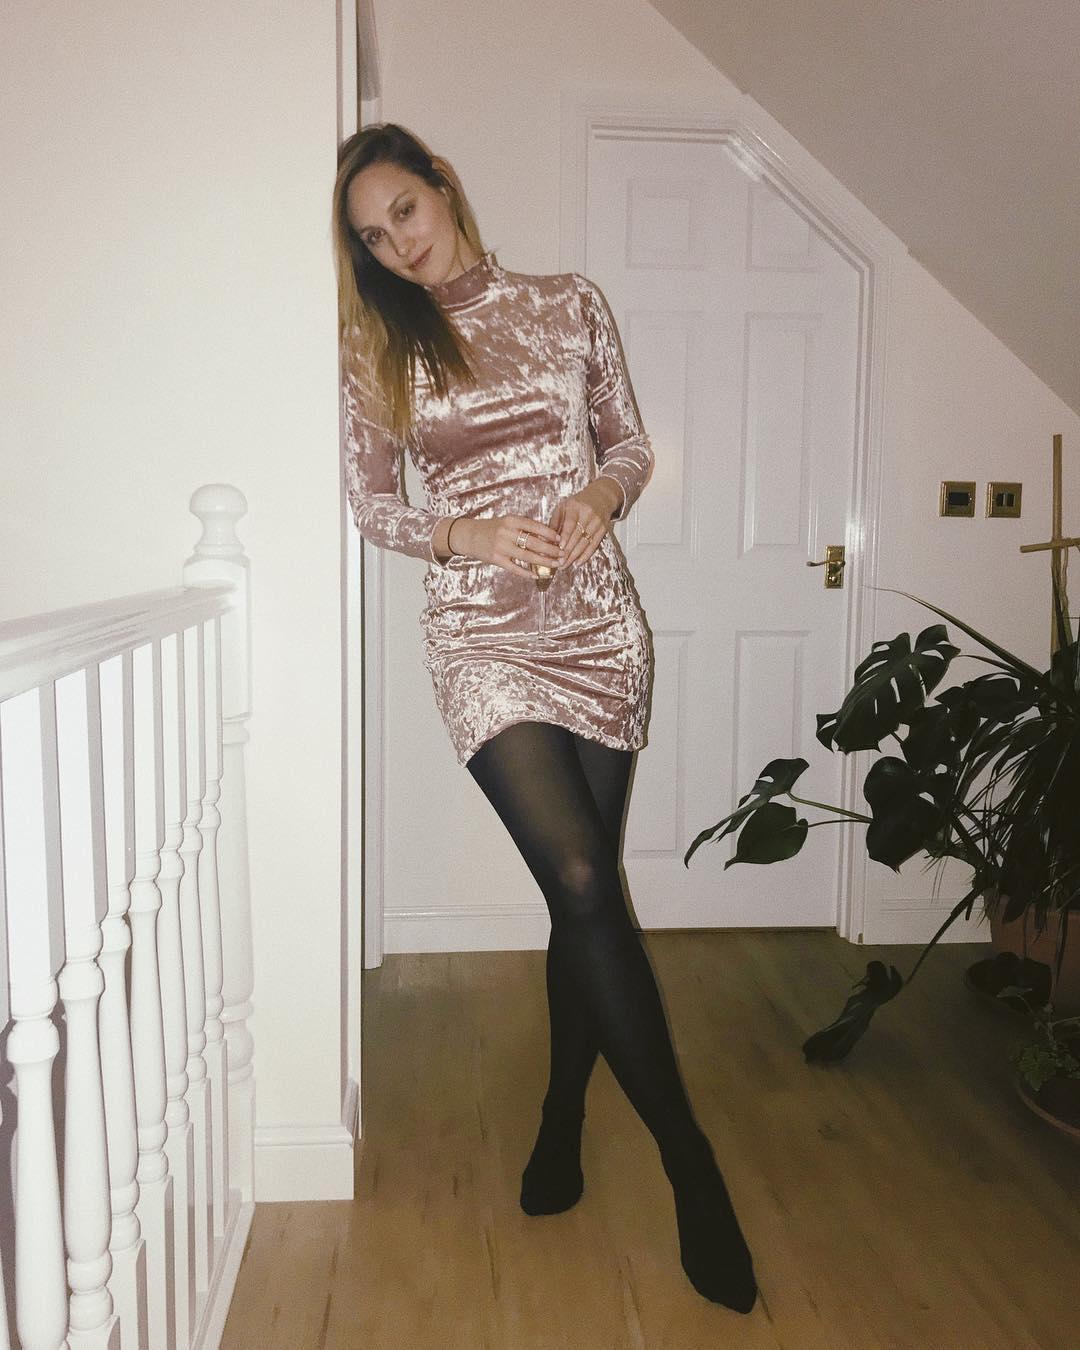 50 Hot And Sexy Sjokz Photos - 12thBlog